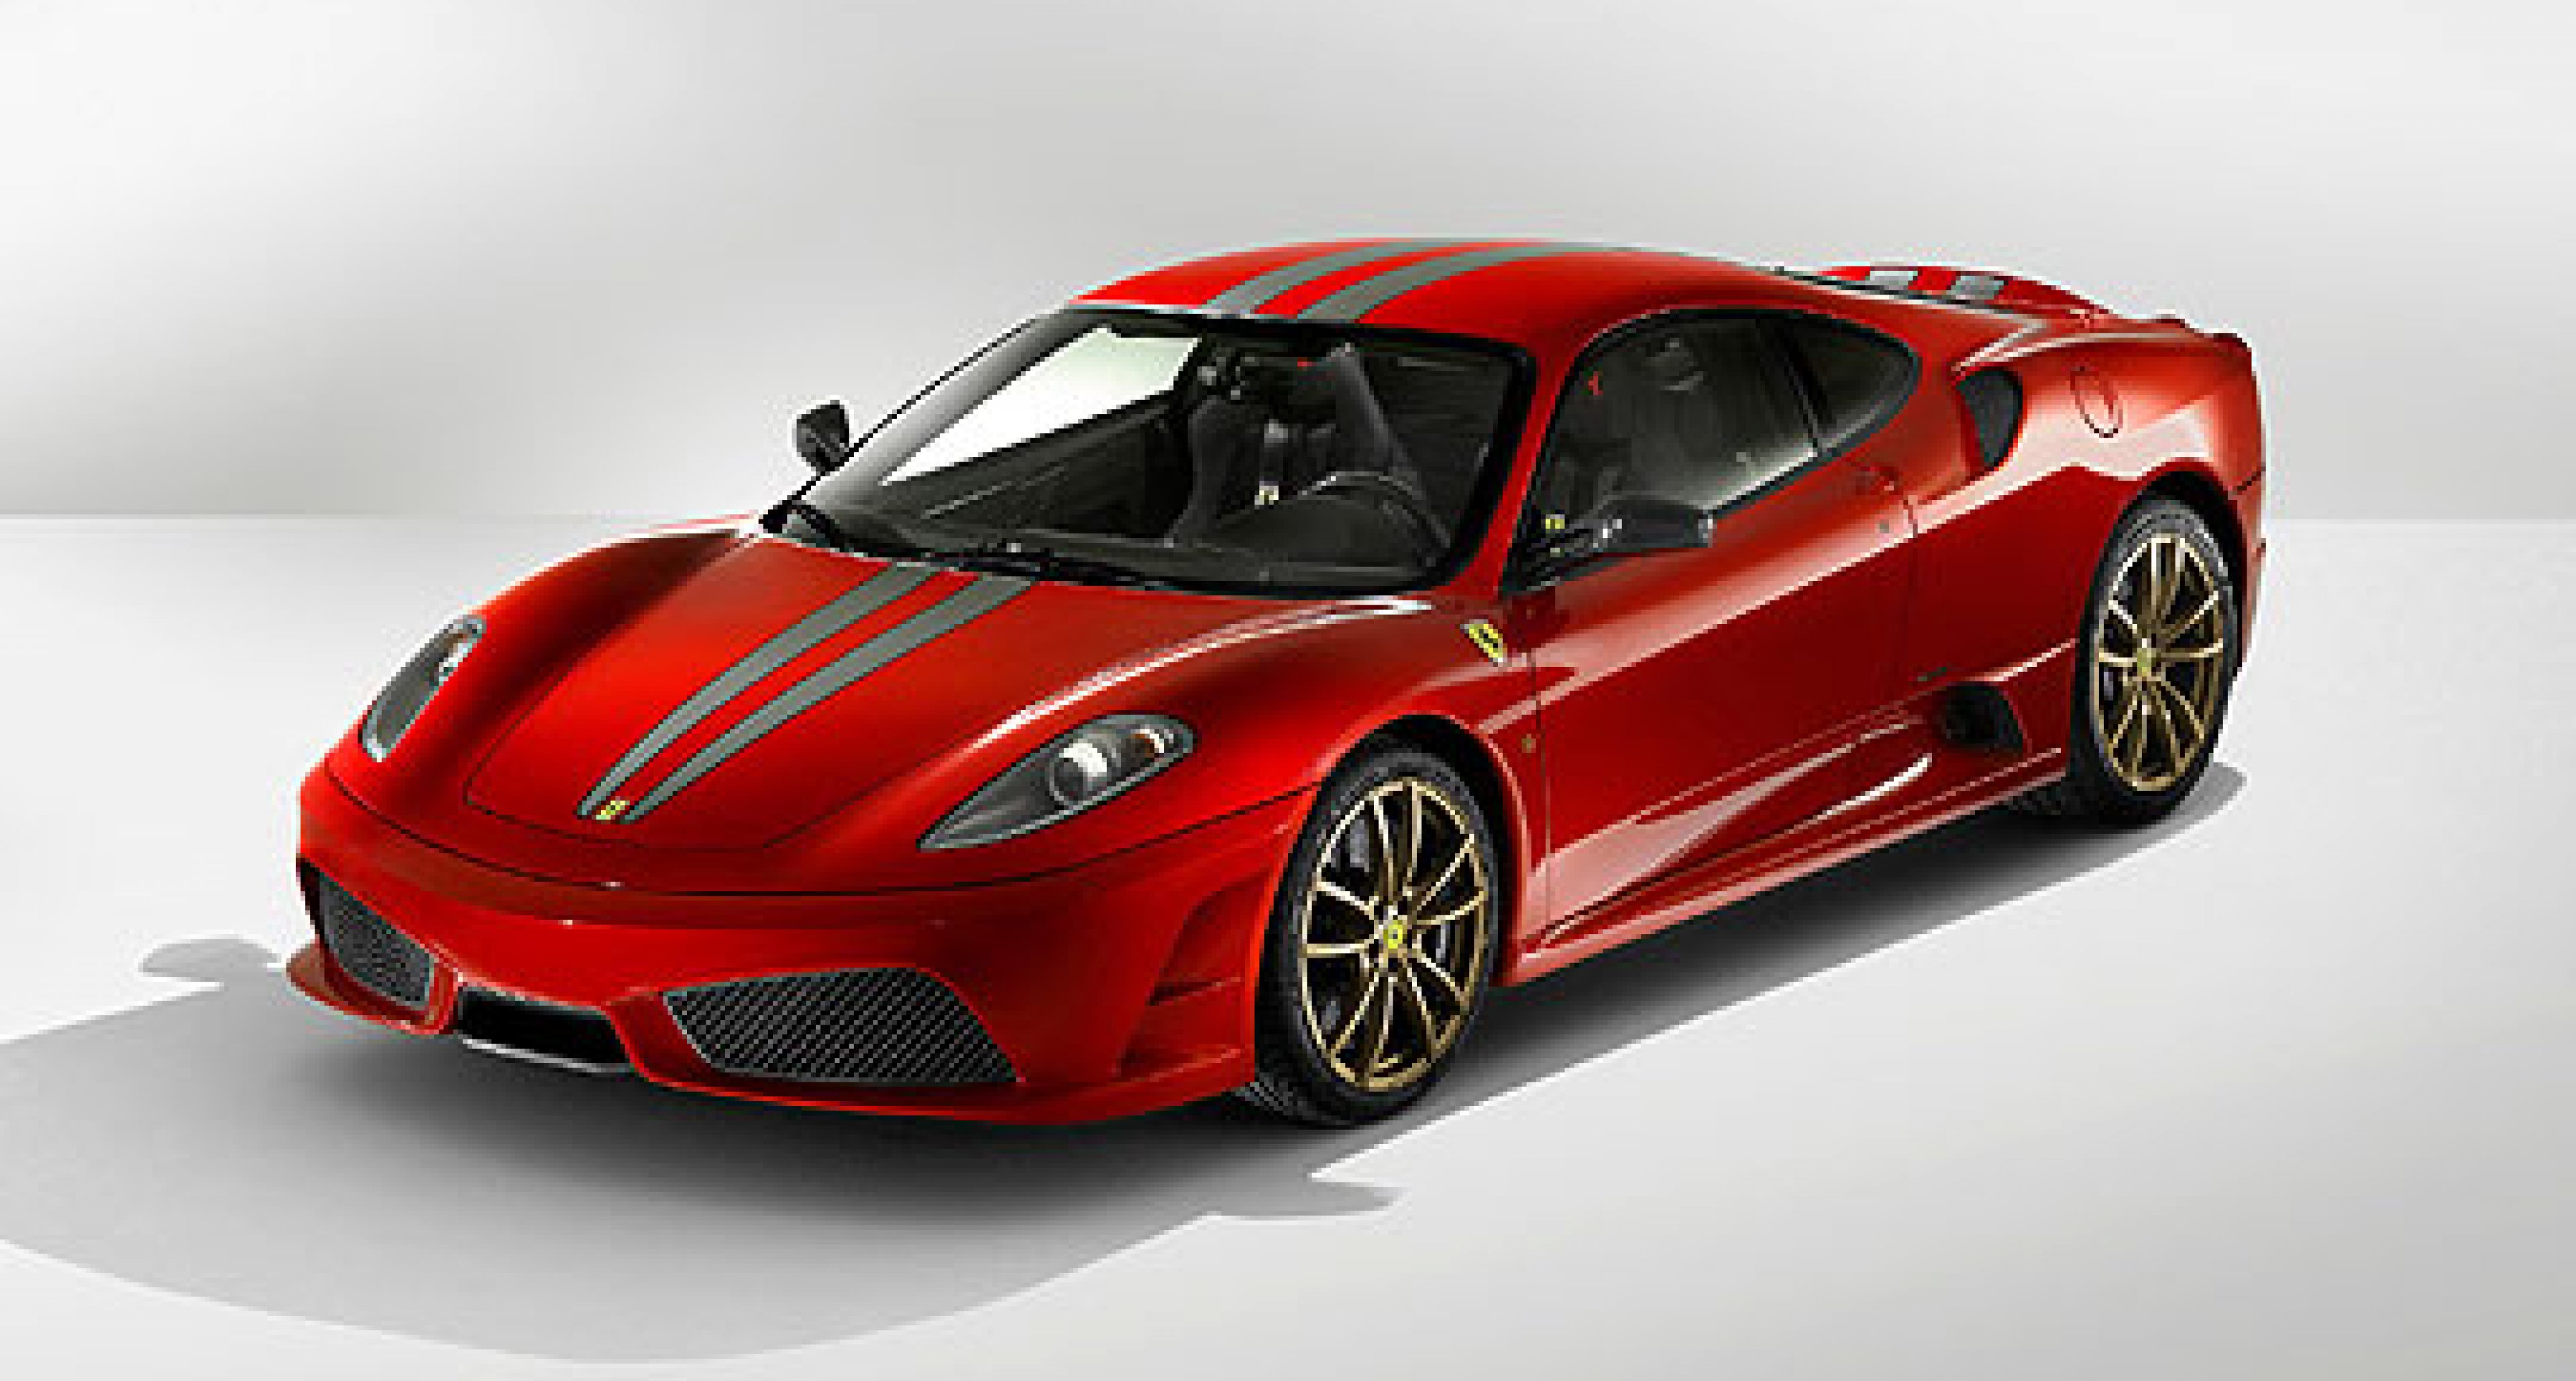 Ferrari 430 Scuderia to debut at Frankfurt